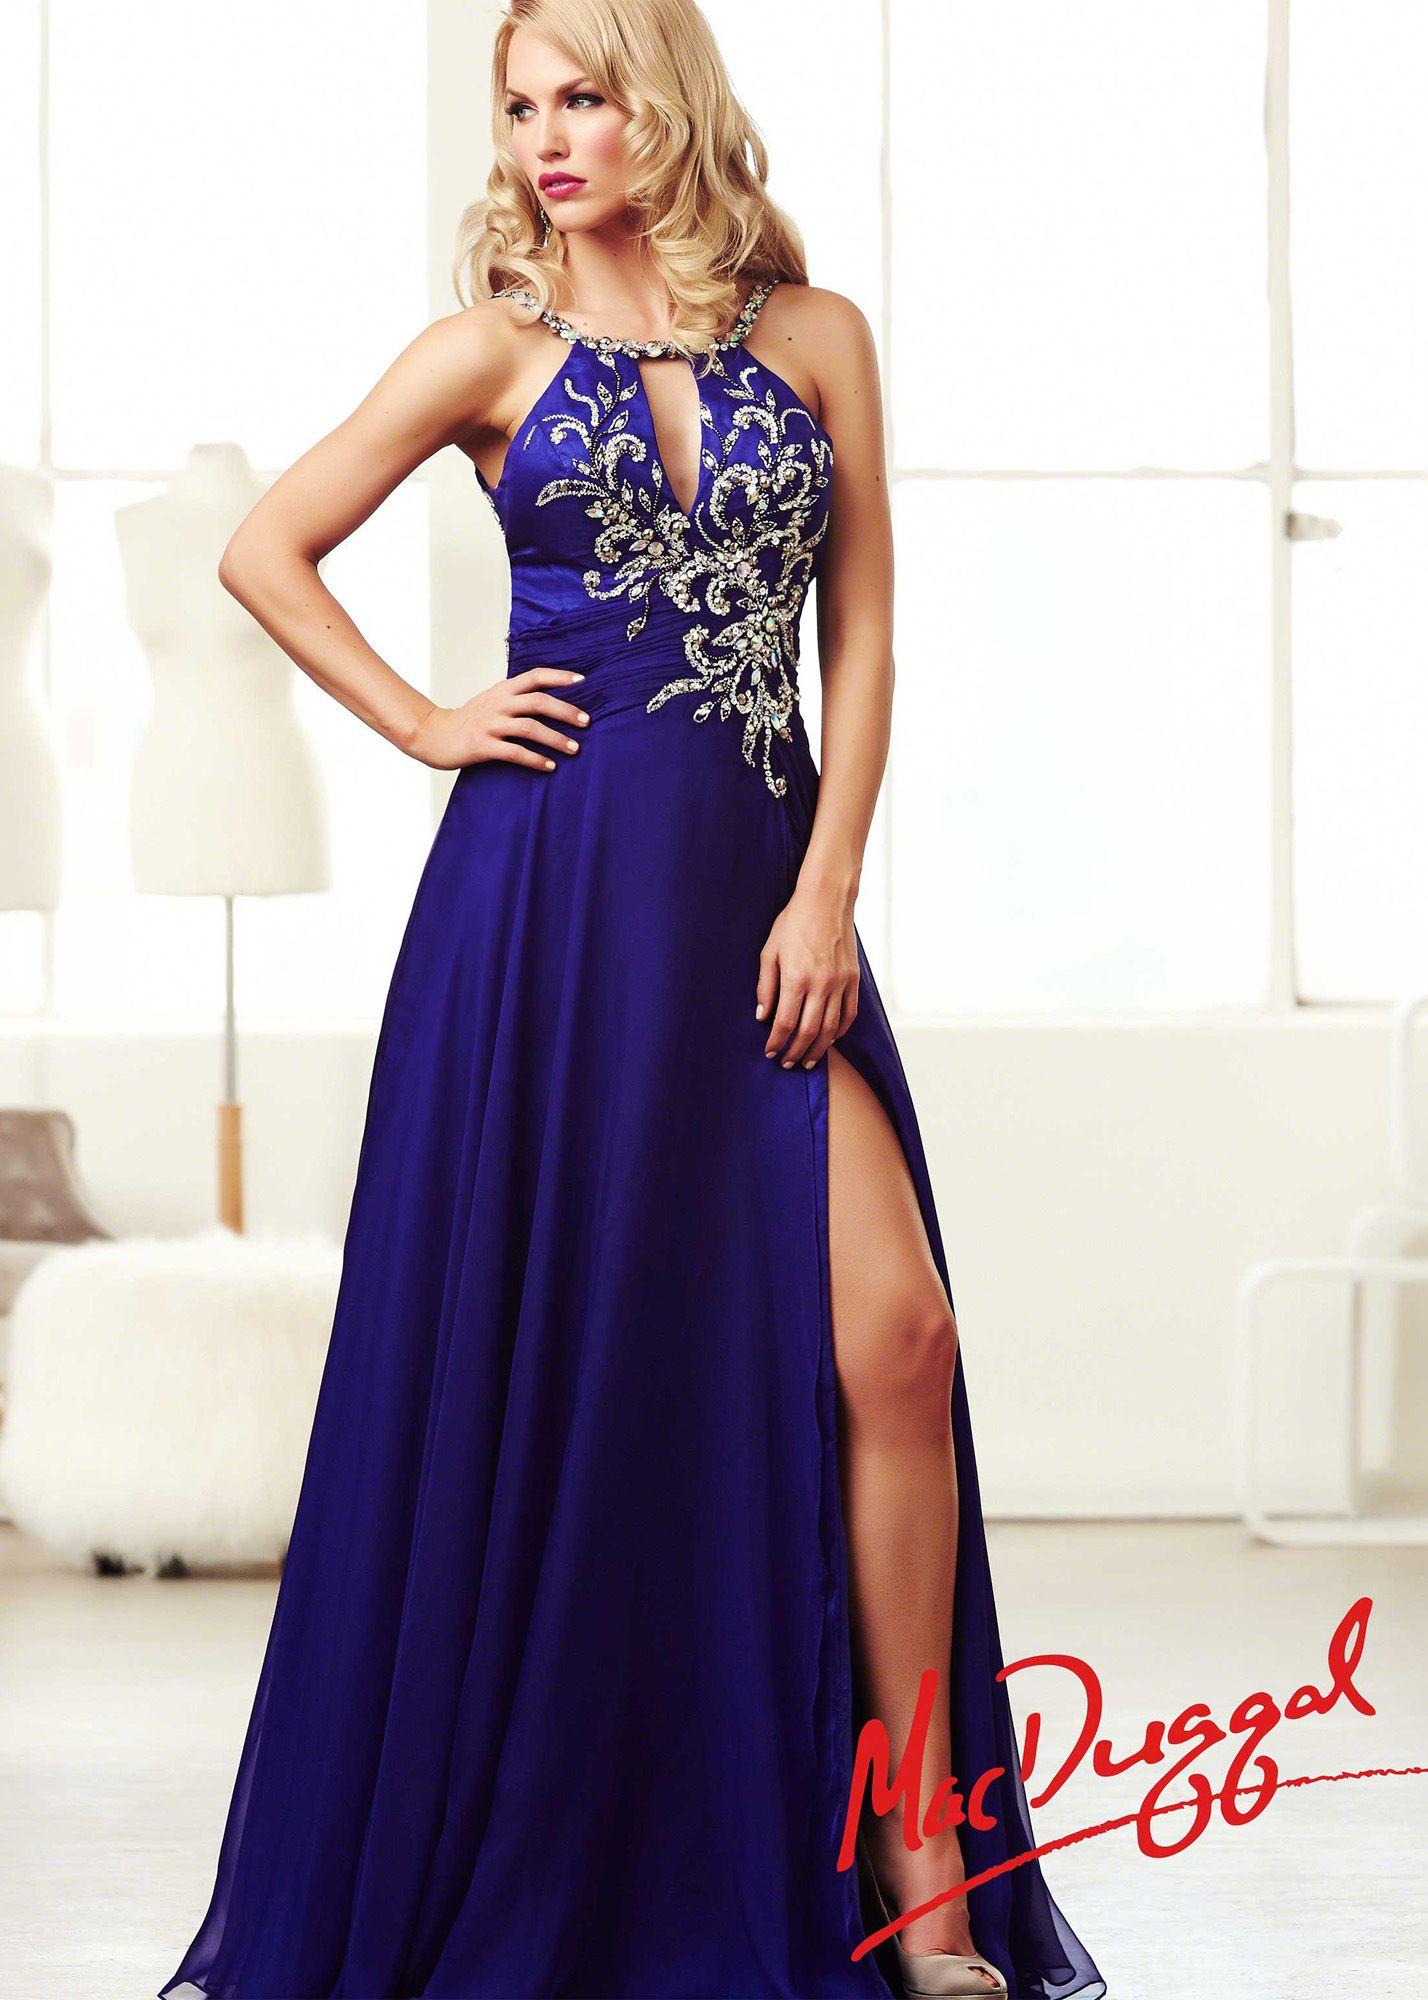 b2d1fed7b84 Mac Duggal 82041M - Cobalt Beaded Halter Chiffon Prom Dresses Online   thepromdresses